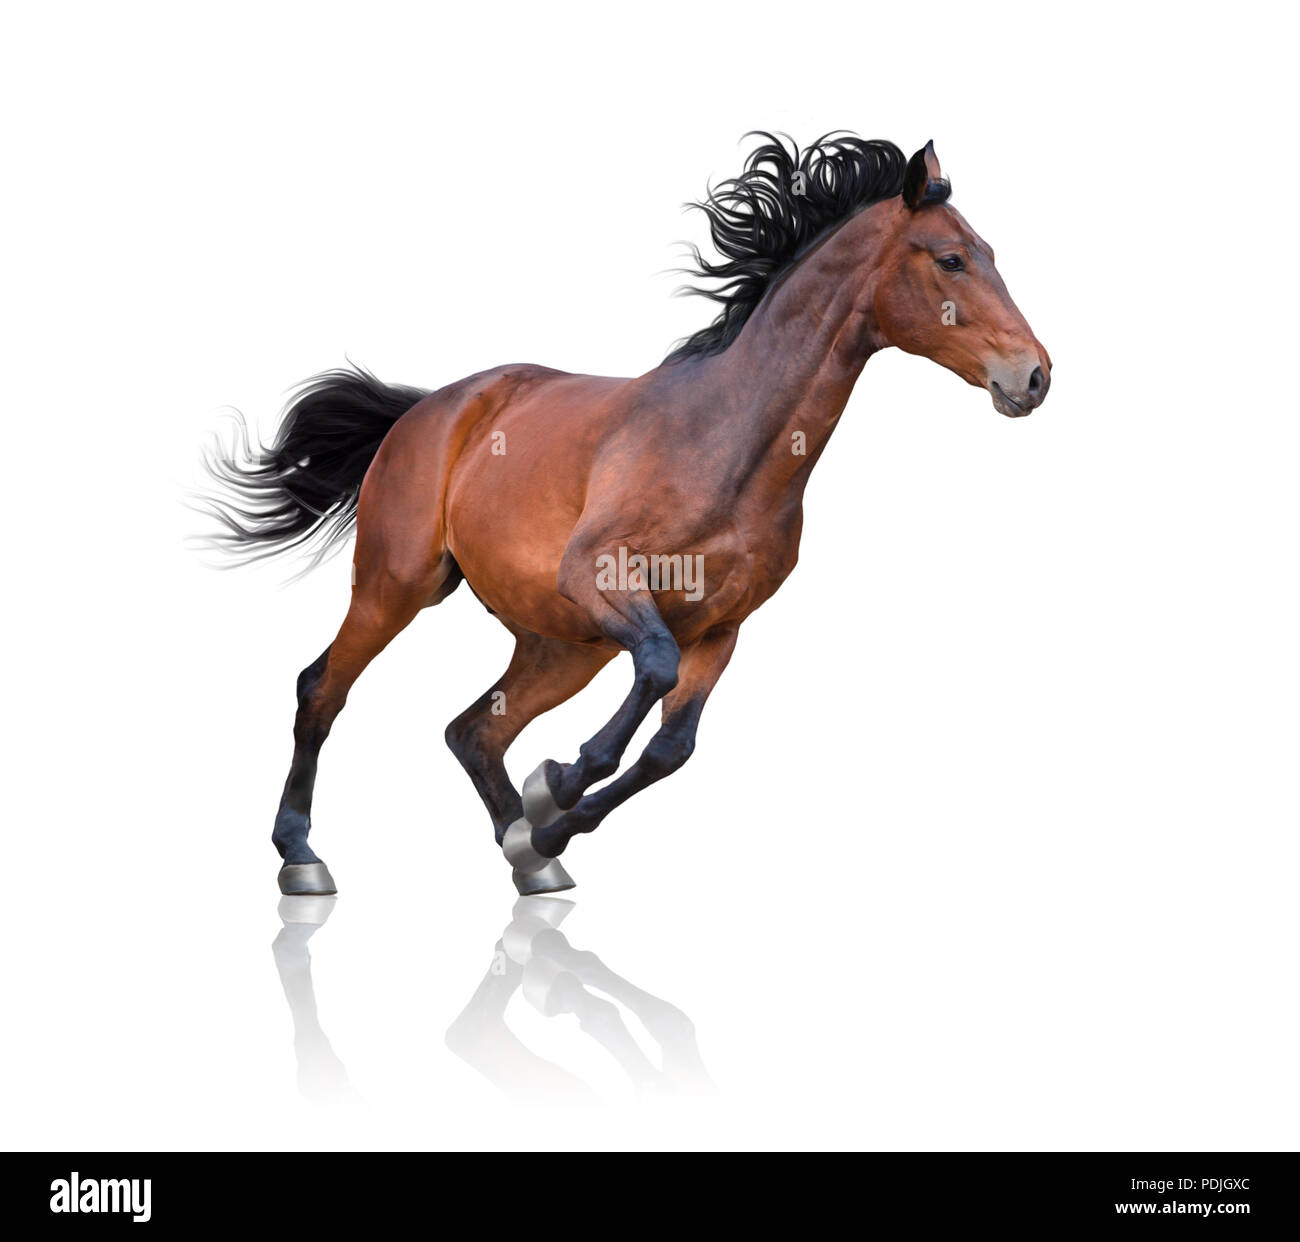 Bay horse runs on the white background - Stock Image